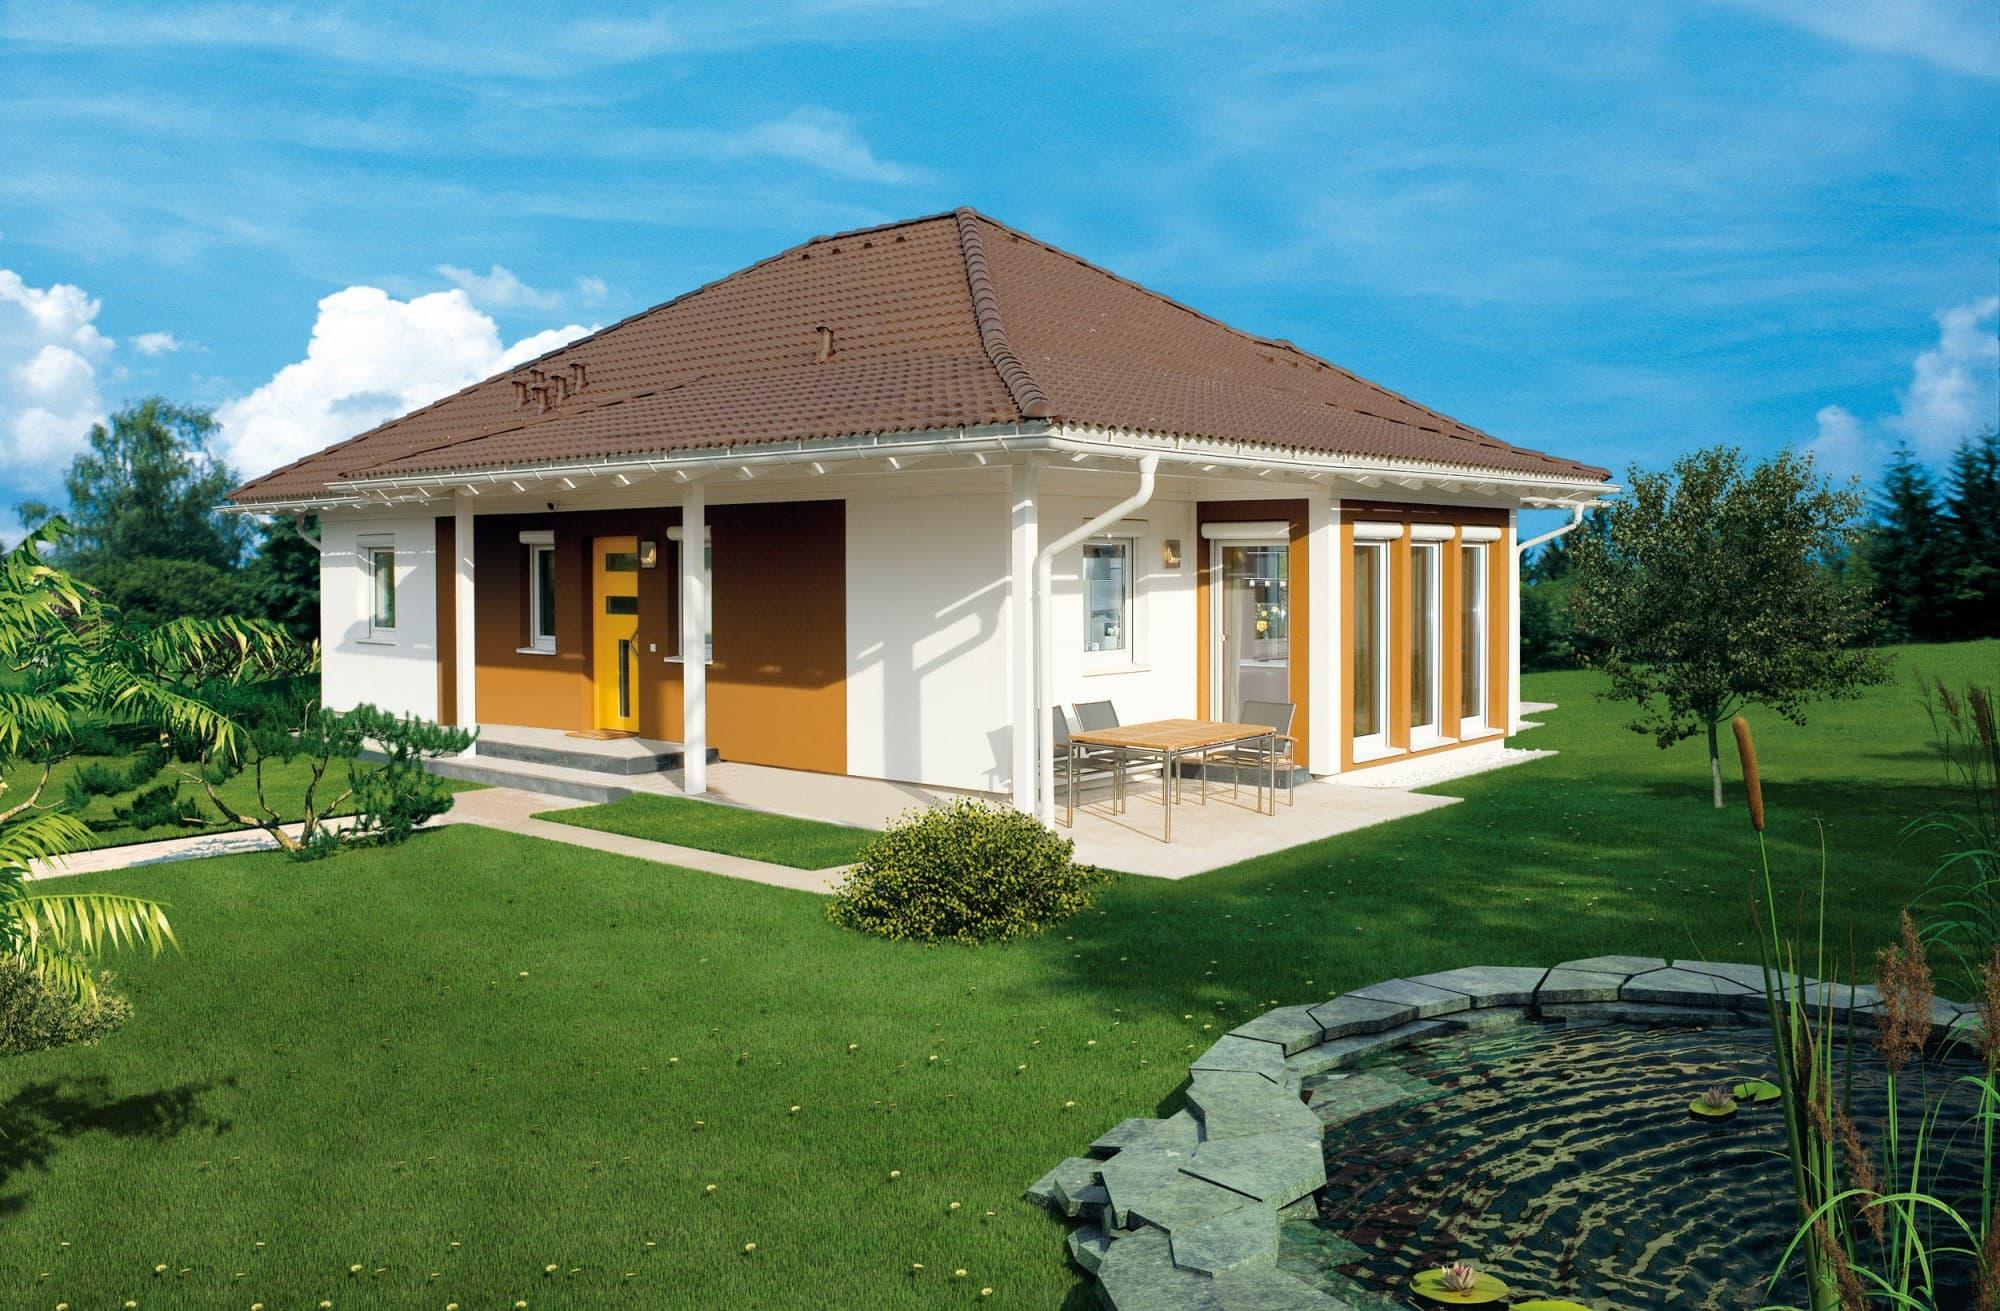 elk bungalow 113 musterhaus in der hausausstellung erfurt. Black Bedroom Furniture Sets. Home Design Ideas